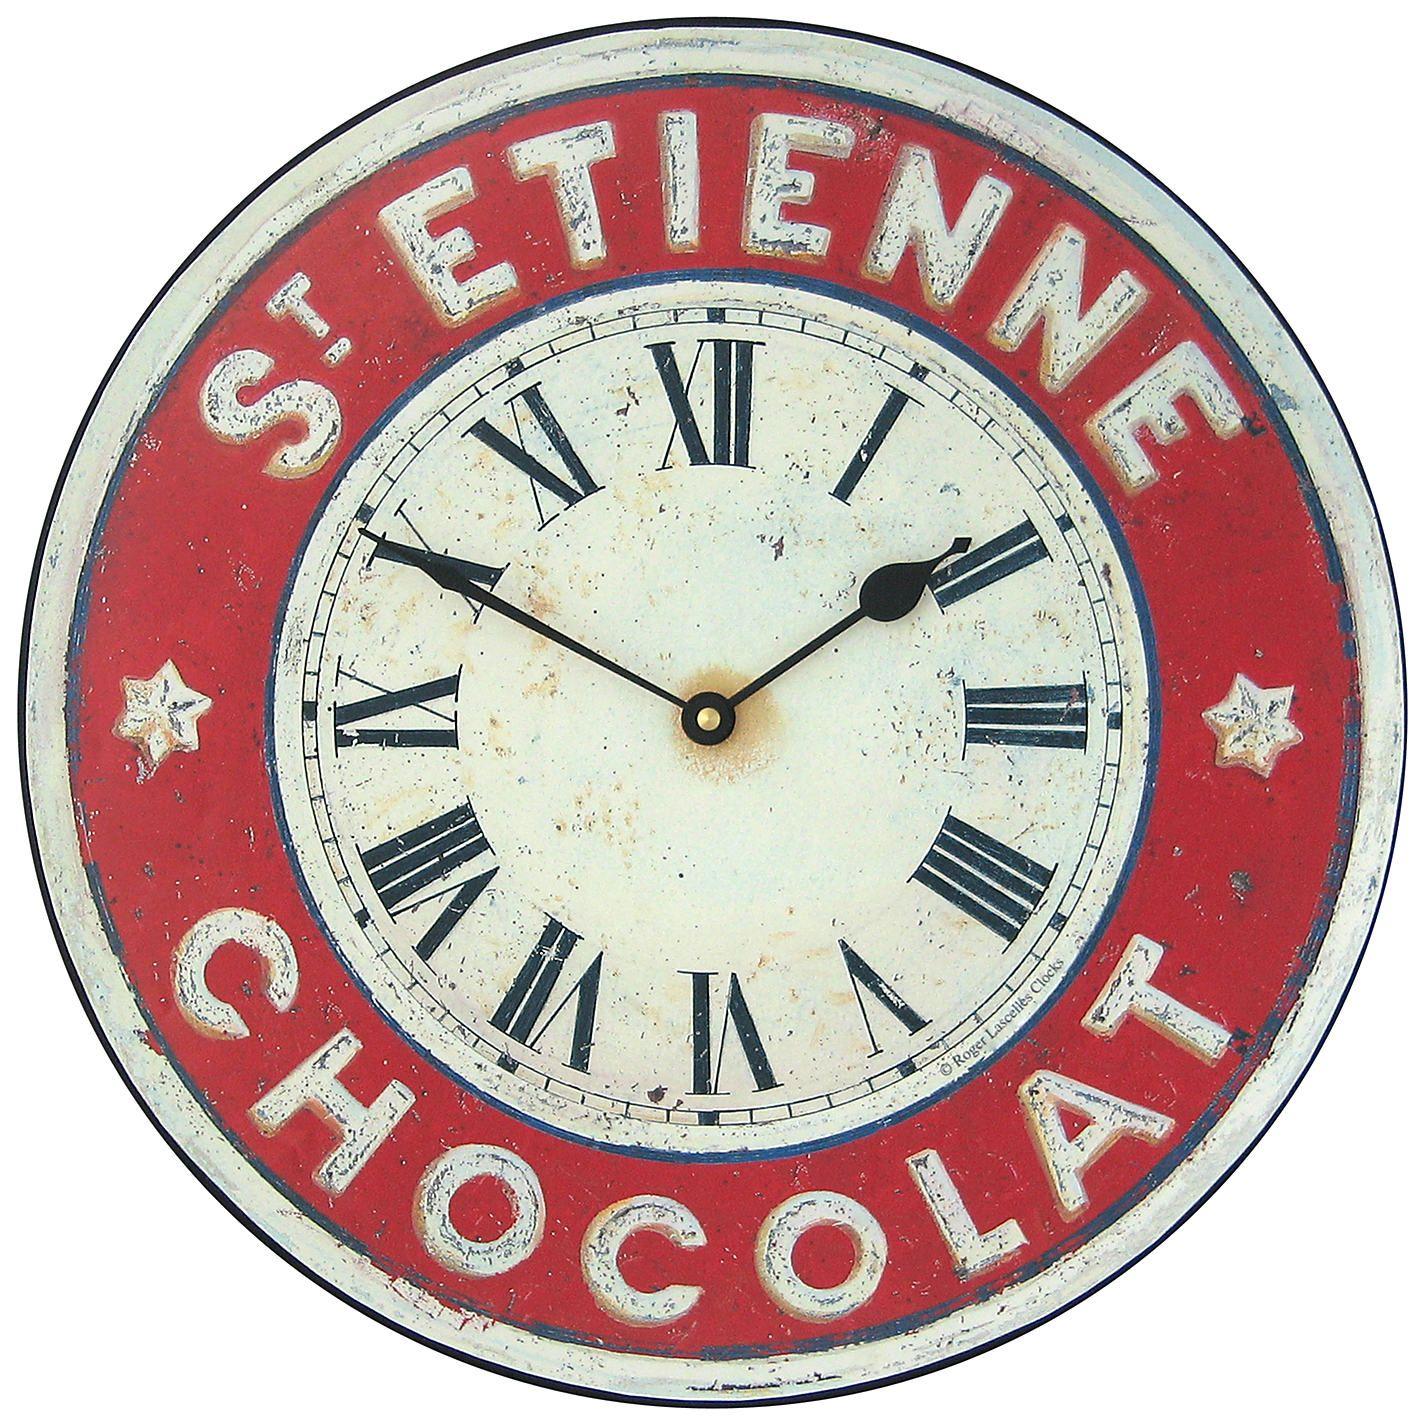 Buy lascelles st etienne wall clock red dia36cm online at john buy lascelles st etienne wall clock red dia36cm online at john lewis amipublicfo Gallery